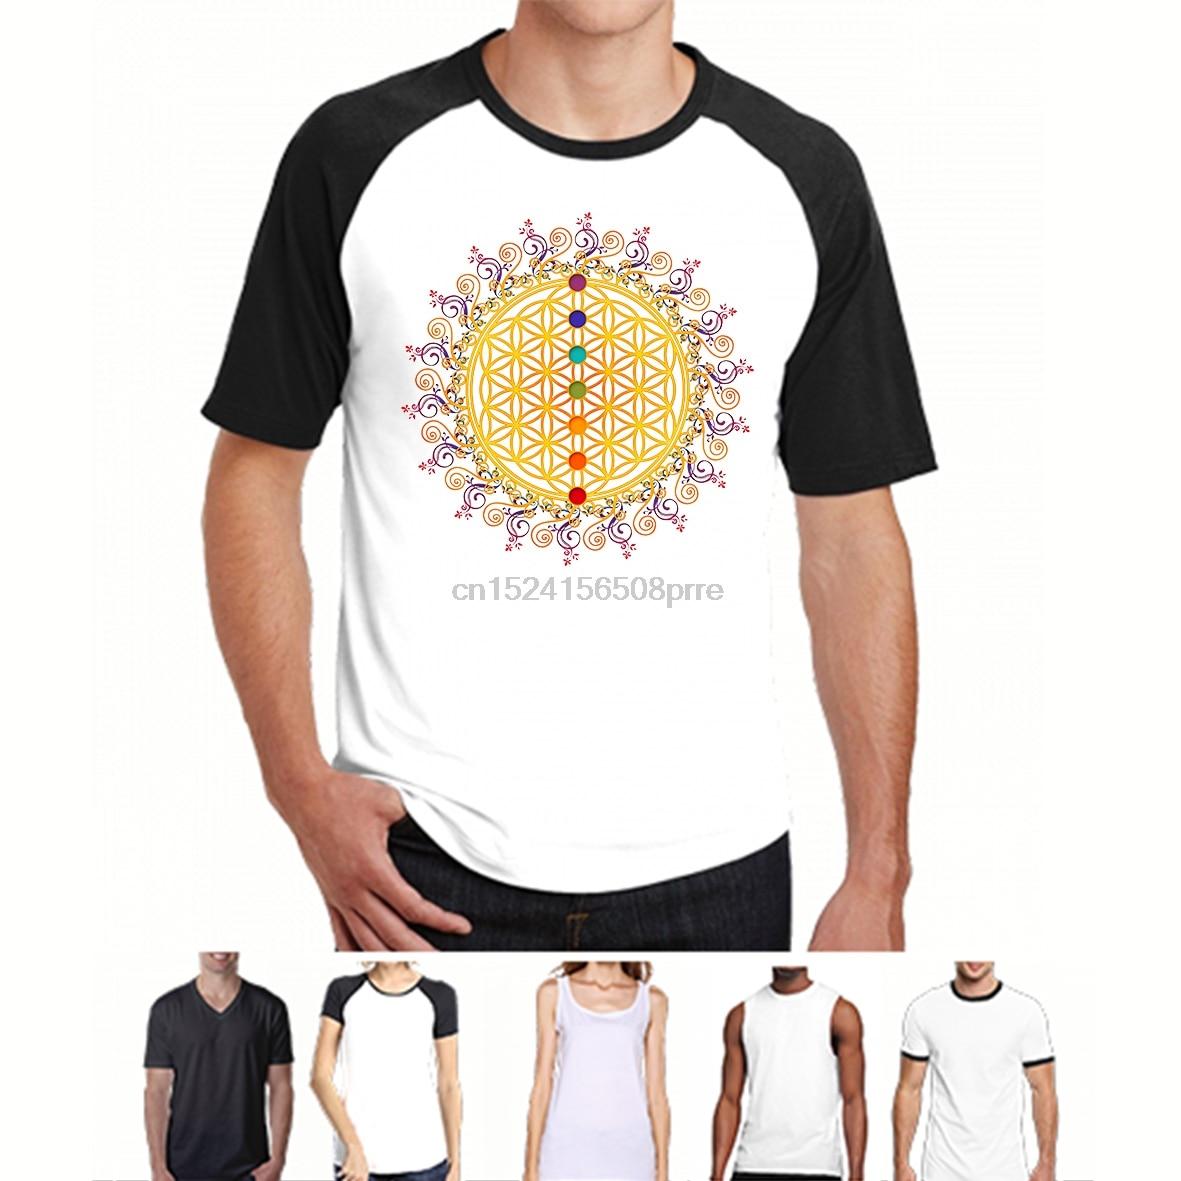 Fashion Cool Men T shirt Women Funny tshirt FLOR DE VIDA CHAKRAS espiritualidad yoga ZEN Customized Printed T-Shirt